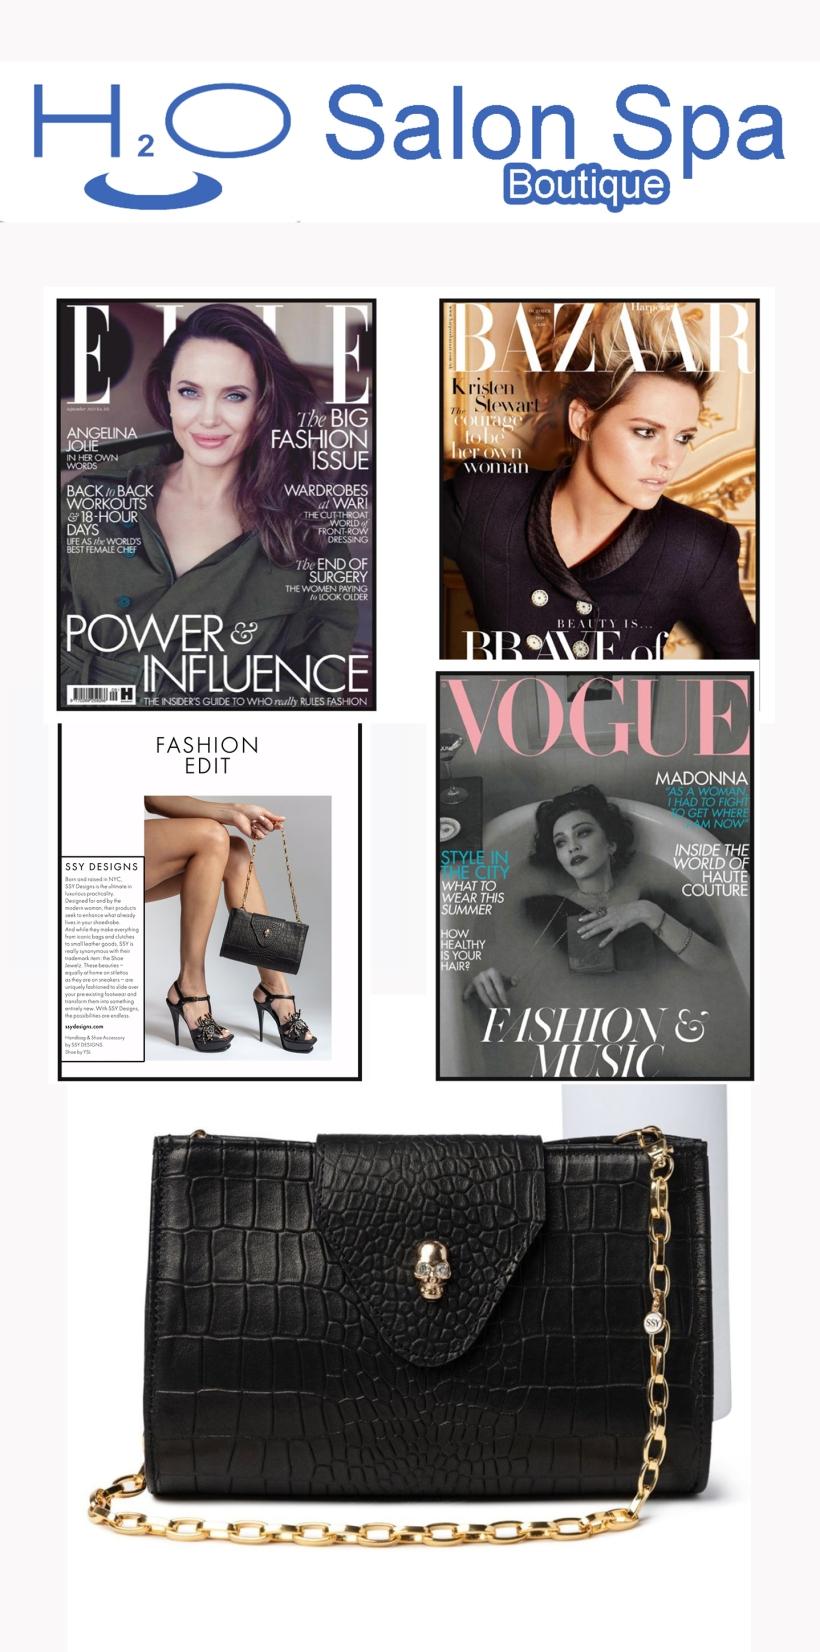 H2O Salon Spa Boutique Luxury Leather Handbags